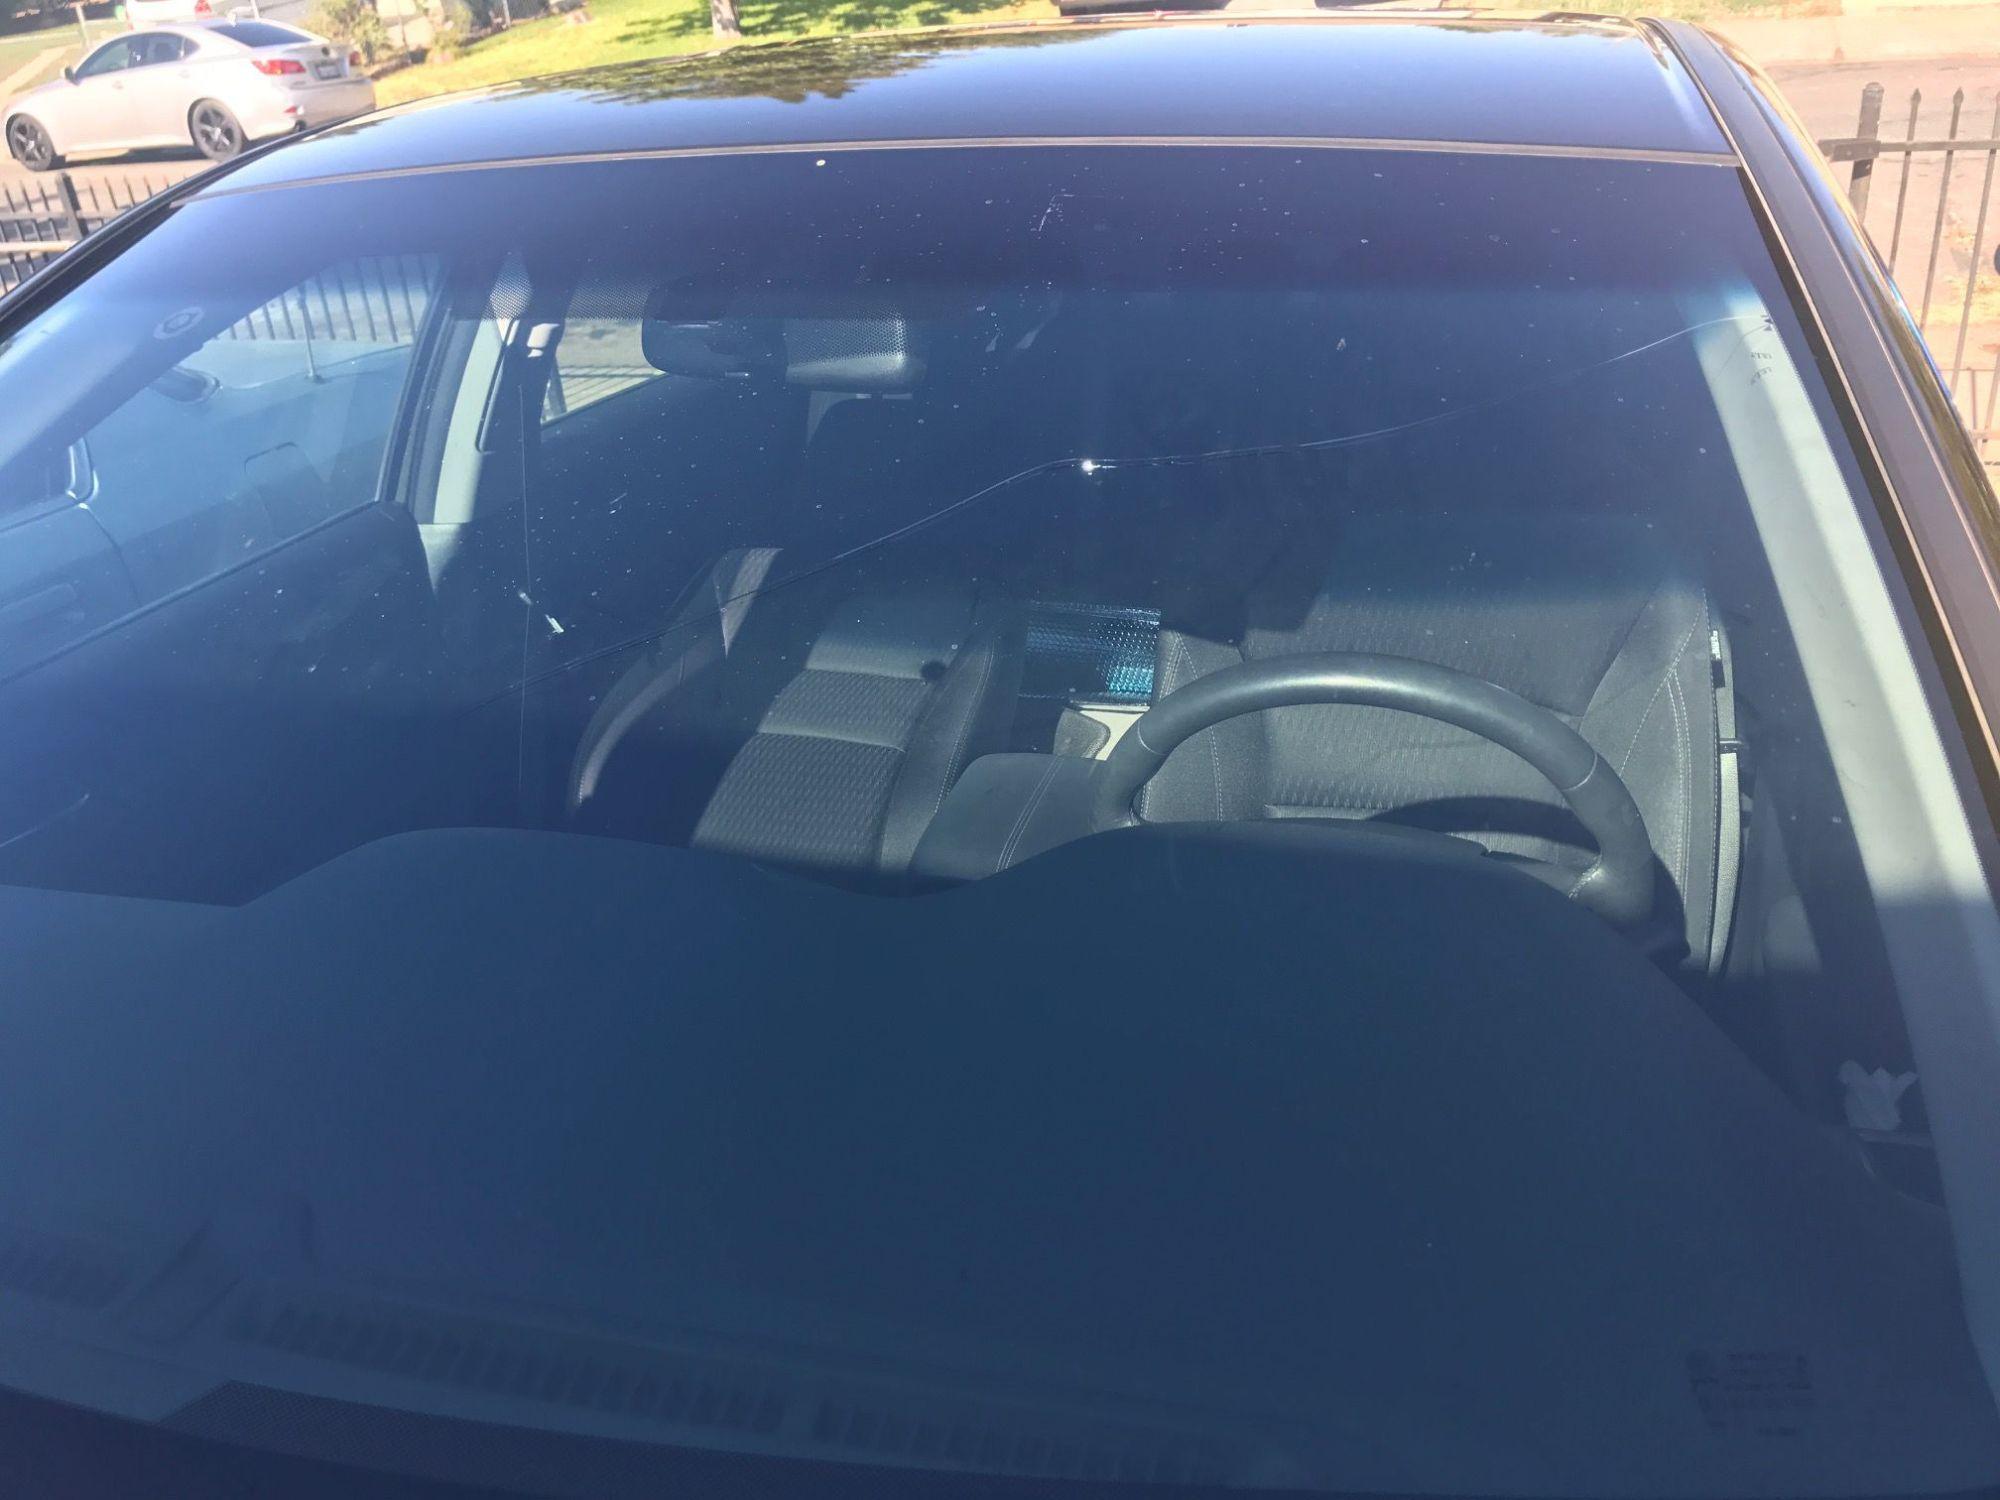 hight resolution of  2013 honda accord 4 door sedan windshield